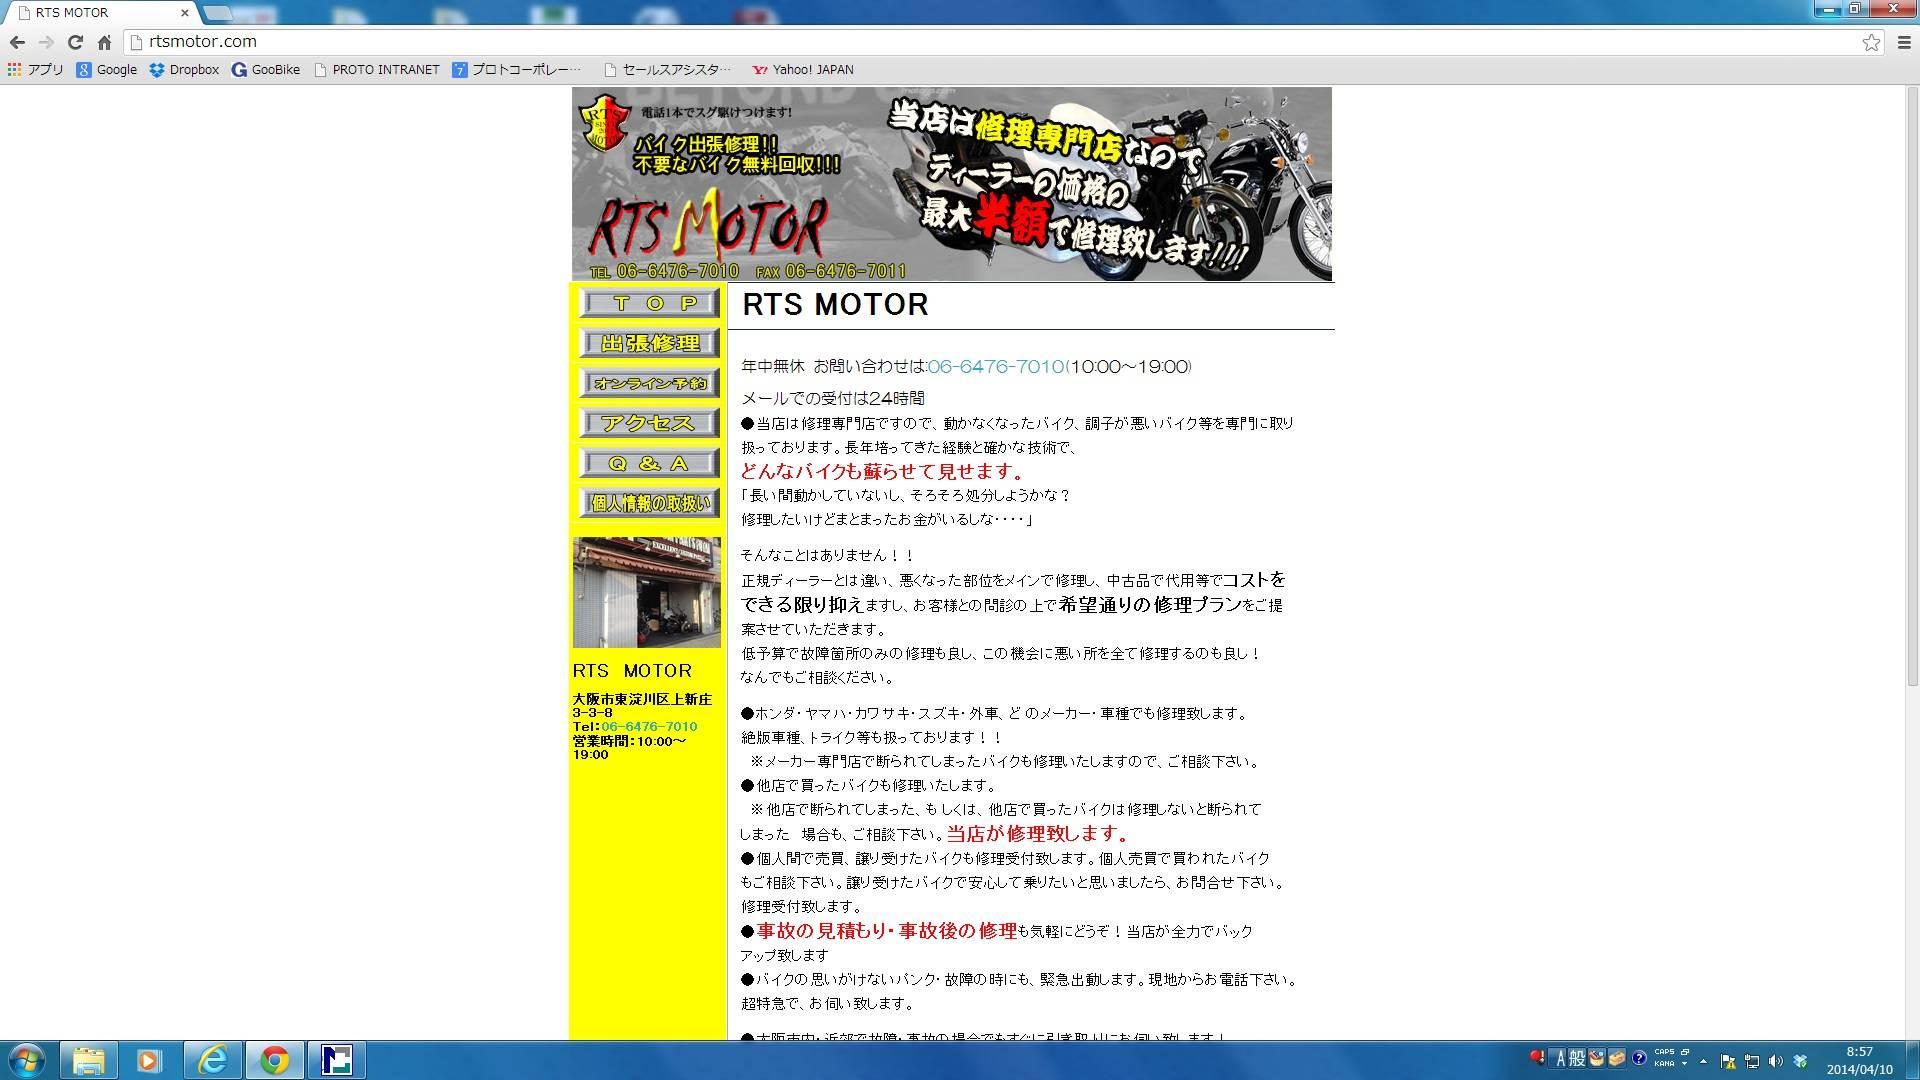 RTS MOTOR